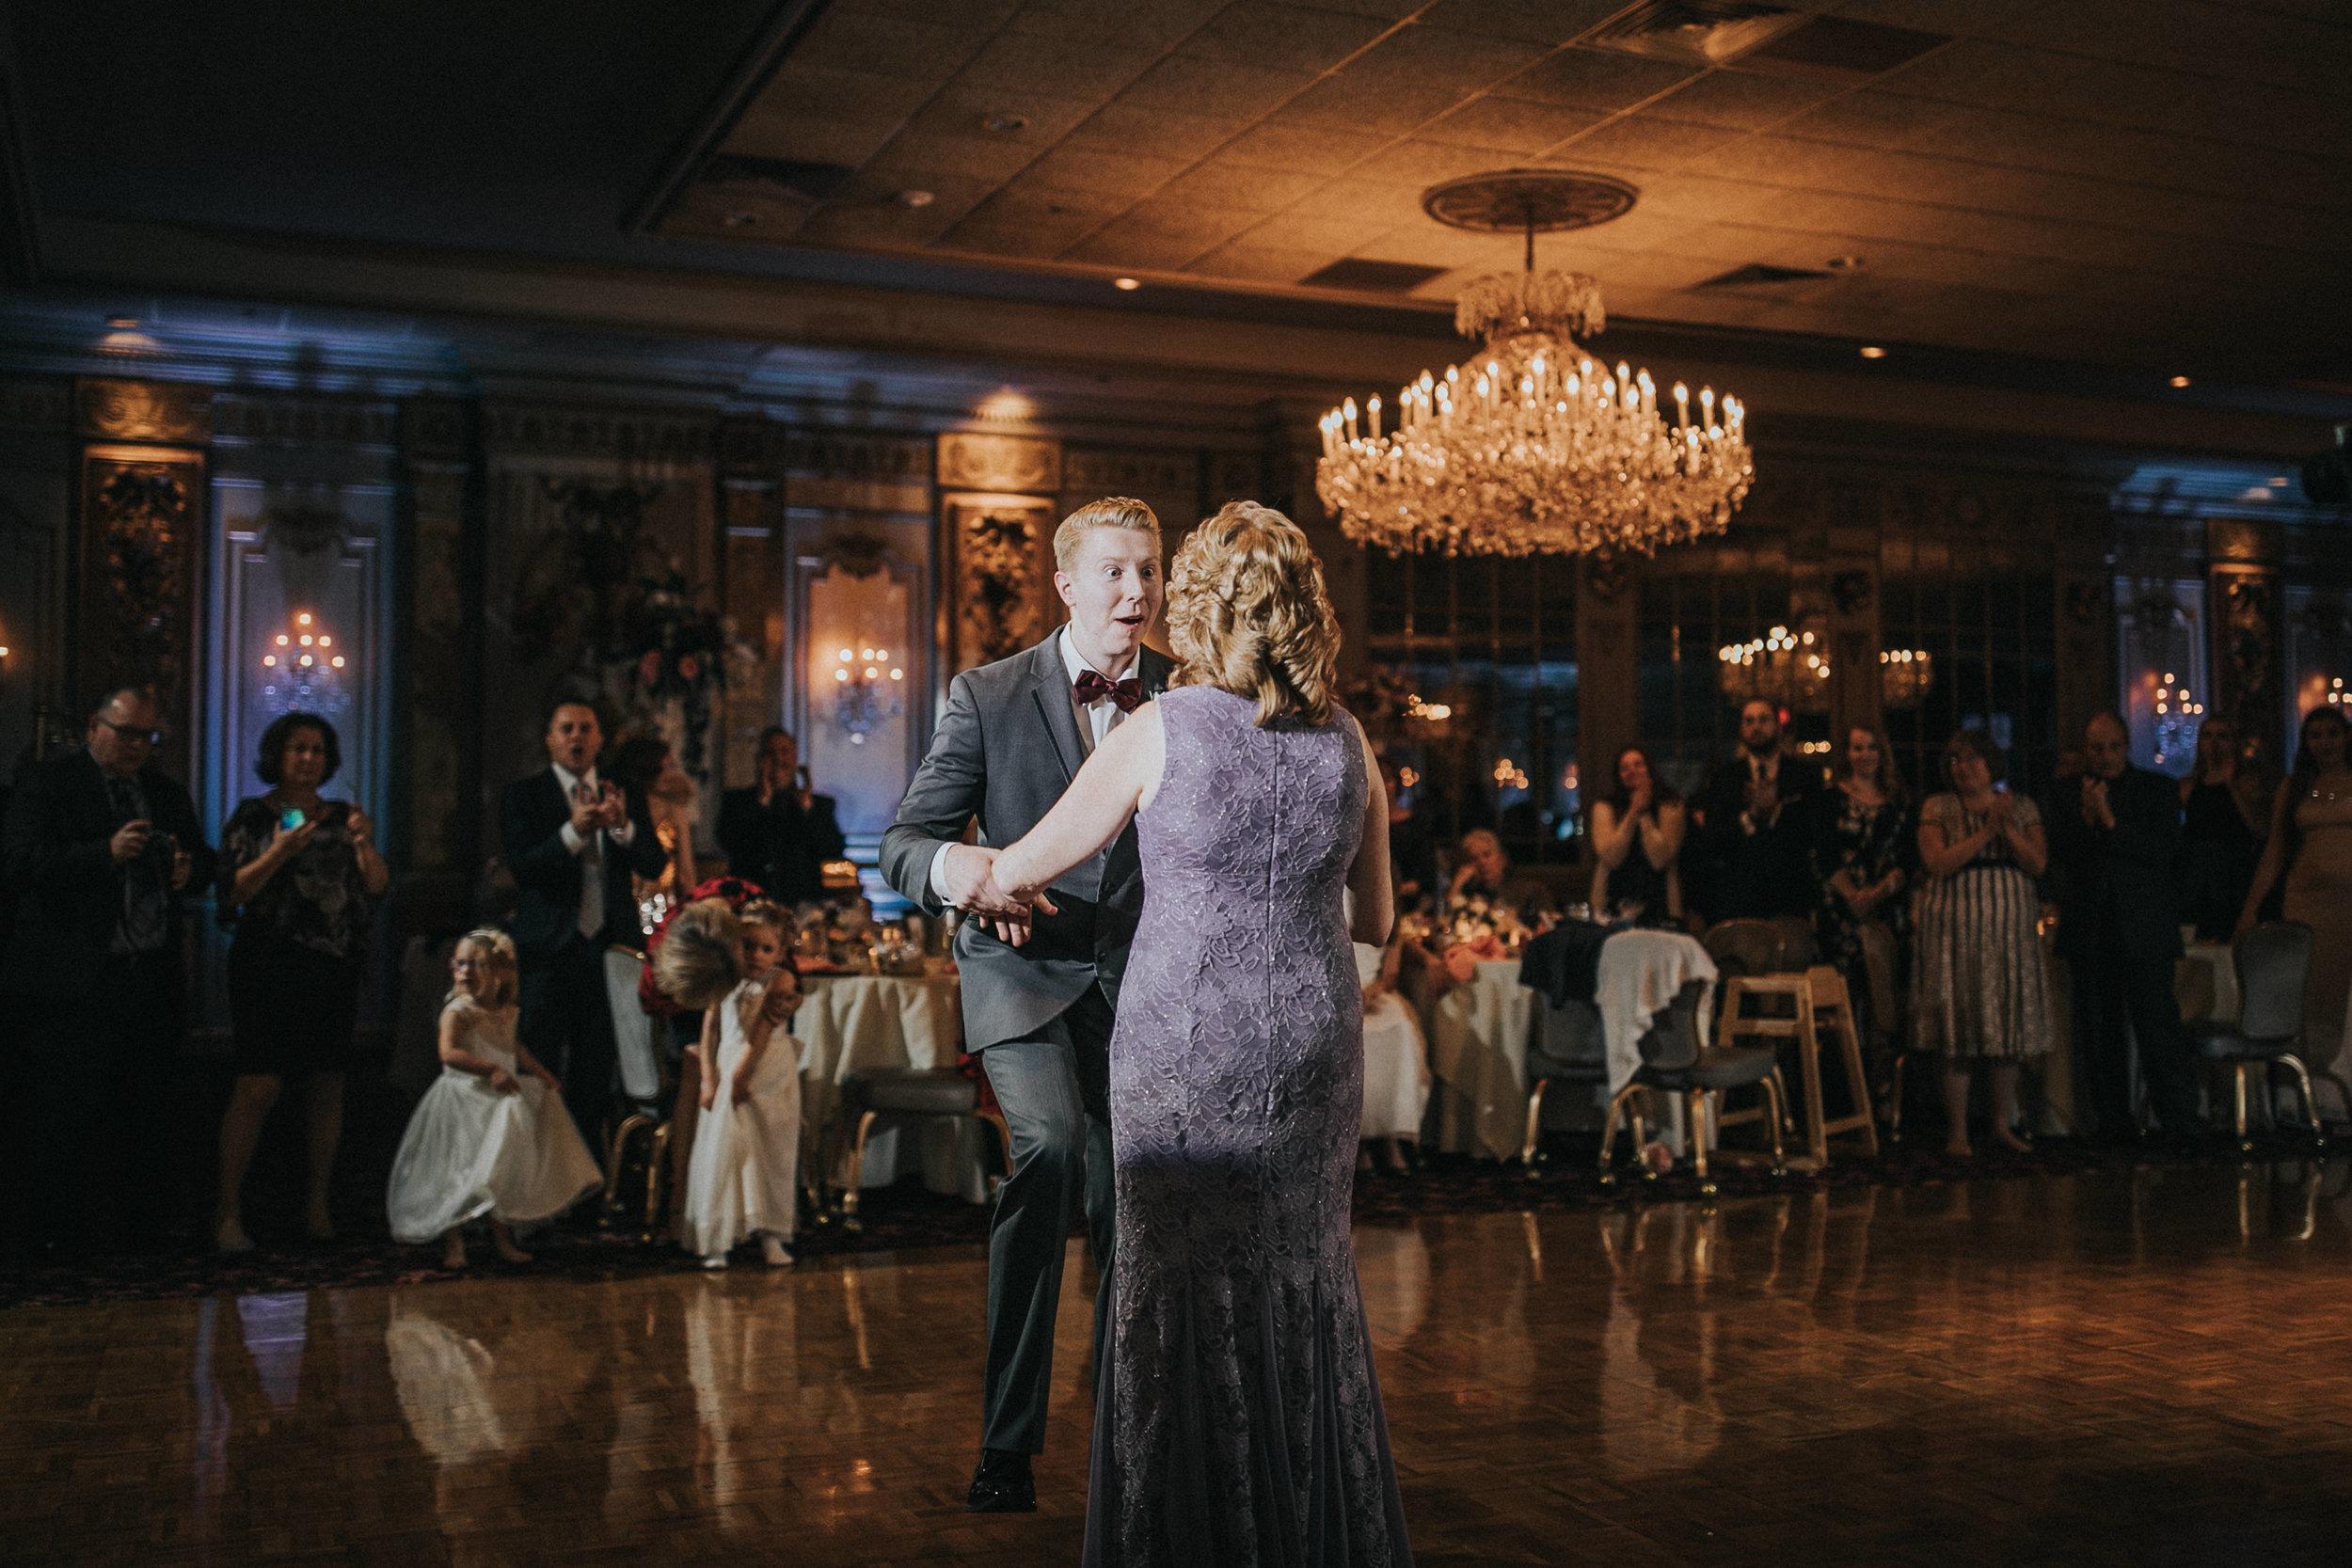 New-Jersey-Wedding-Photography-Fishers-Tudor-House-JennaLynnPhotography-Reception-Kathleen&Eddie-121.jpg